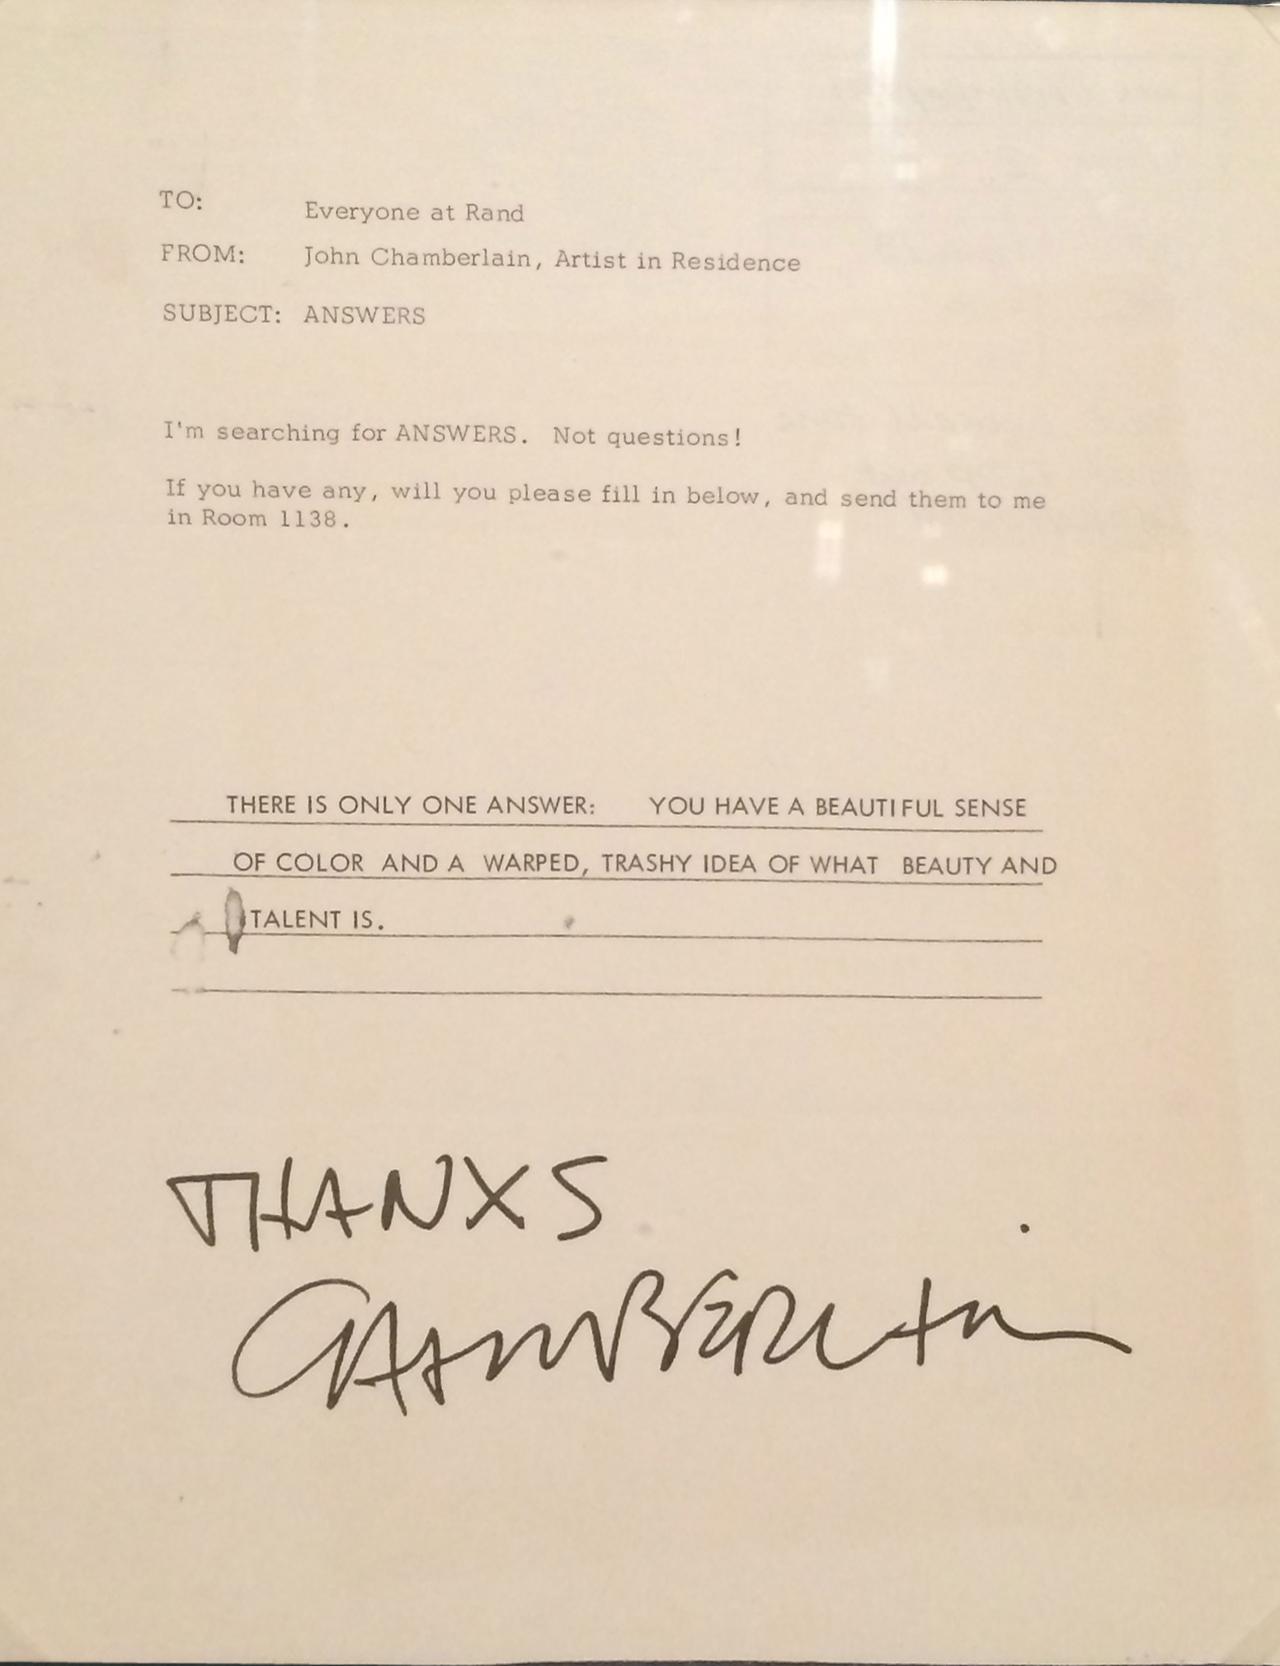 A&T_John Chamberlain memo